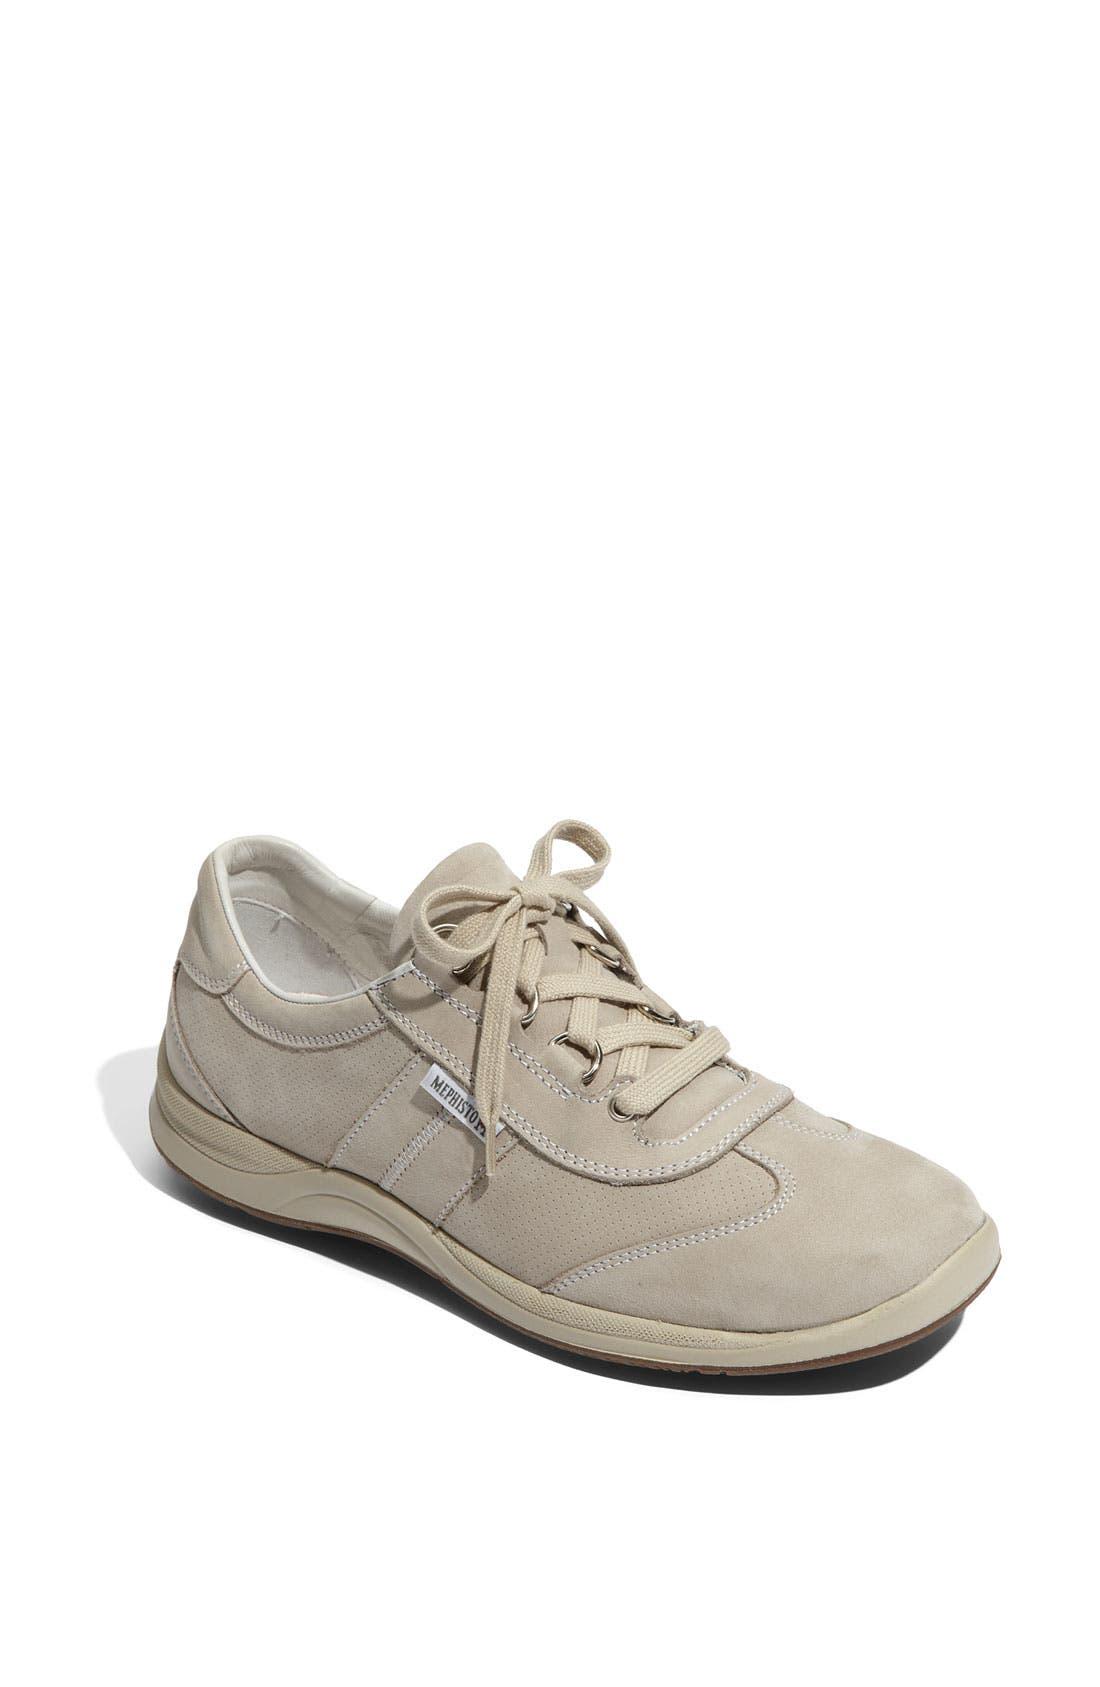 Main Image - Mephisto Perforated Walking Shoe (Women)